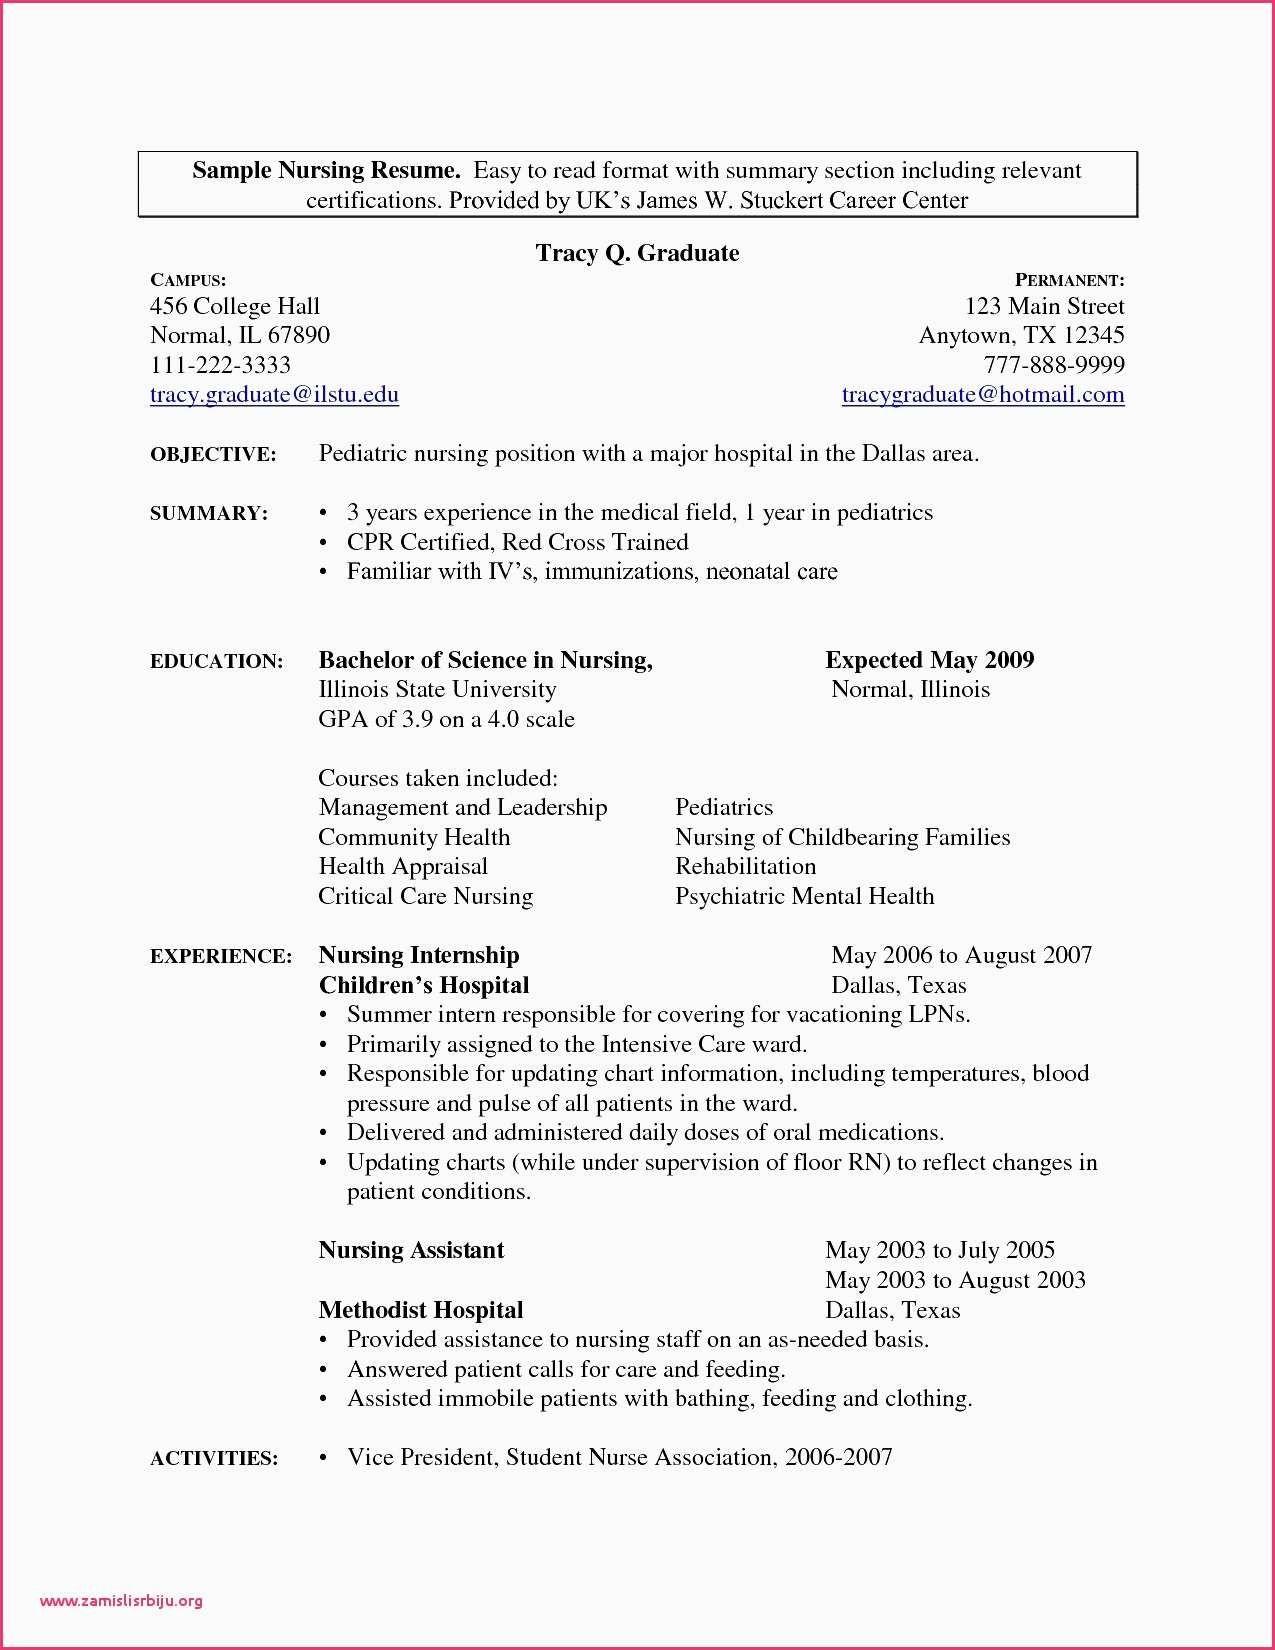 Legal Nurse Cover Letter | Sample Resume For Legal Assistants Legal ...